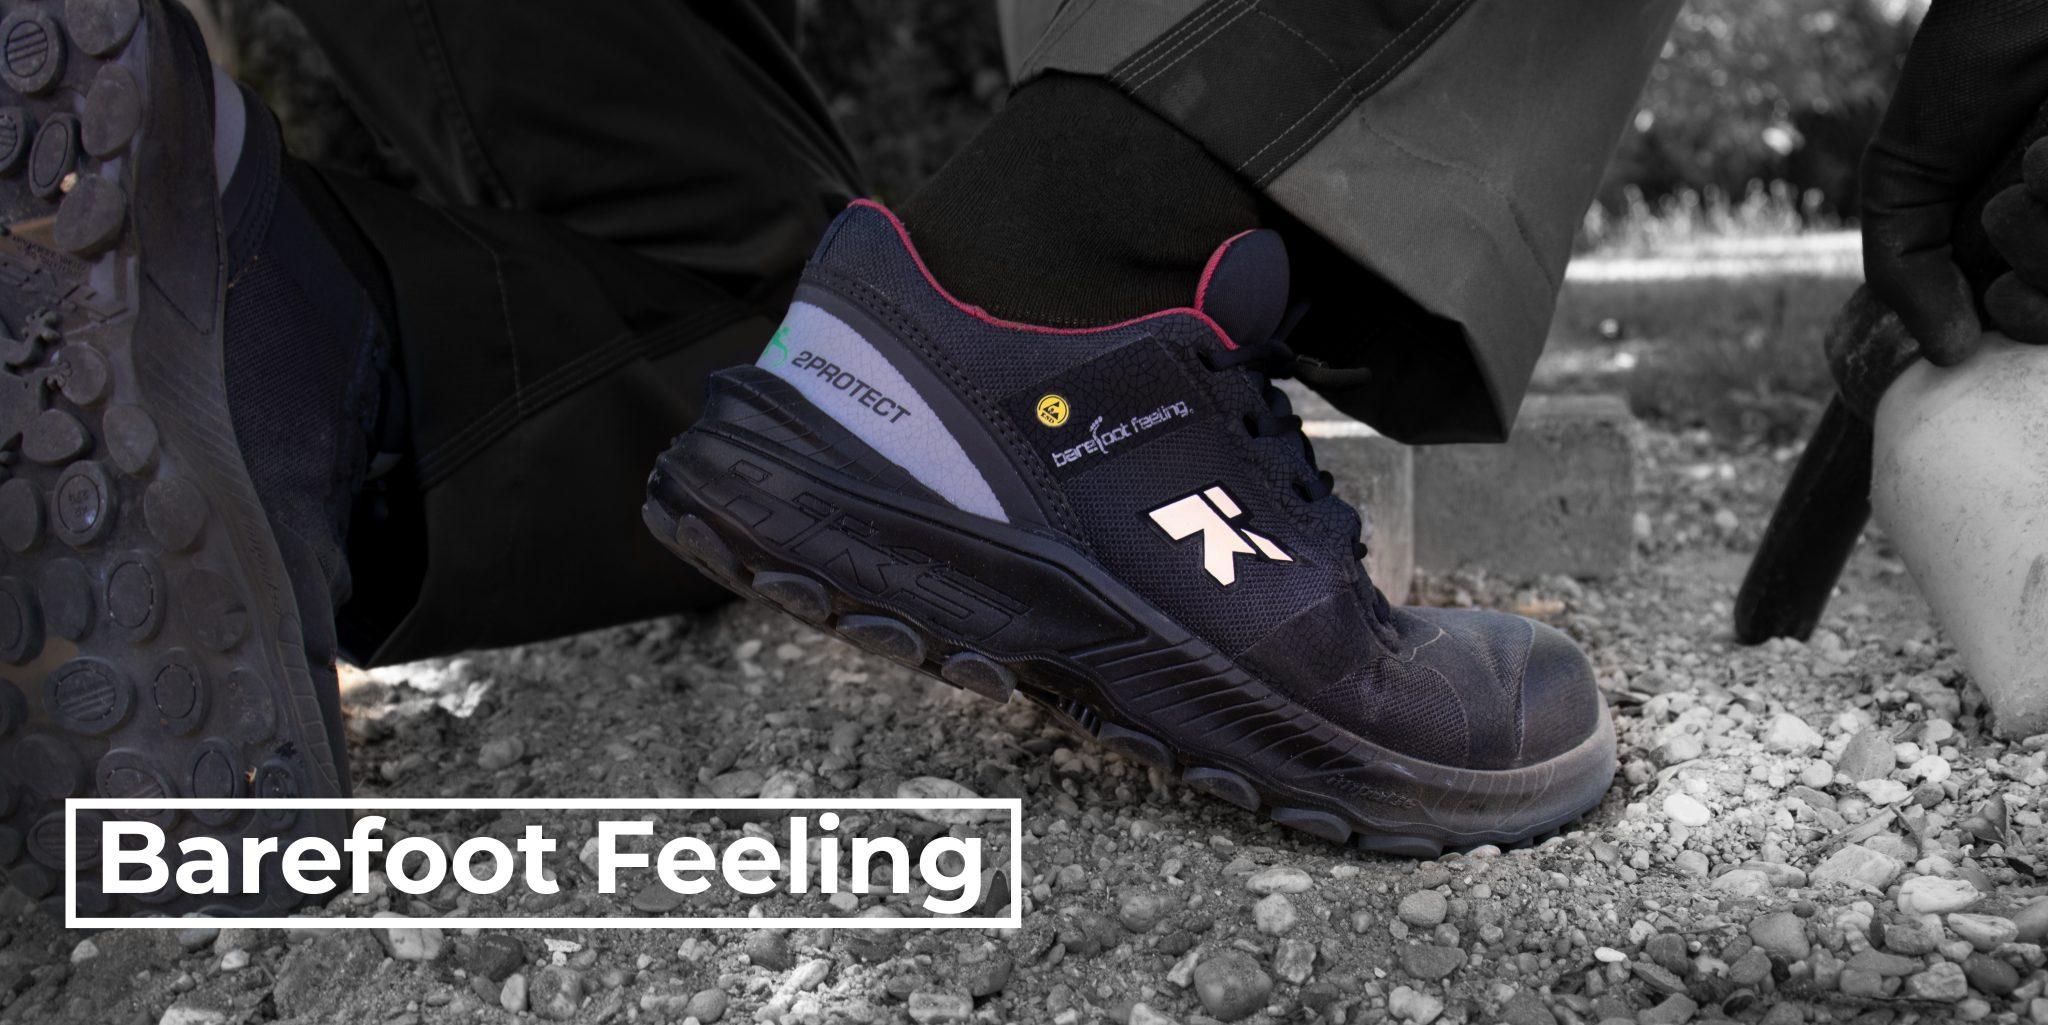 Barefoot-Feeling